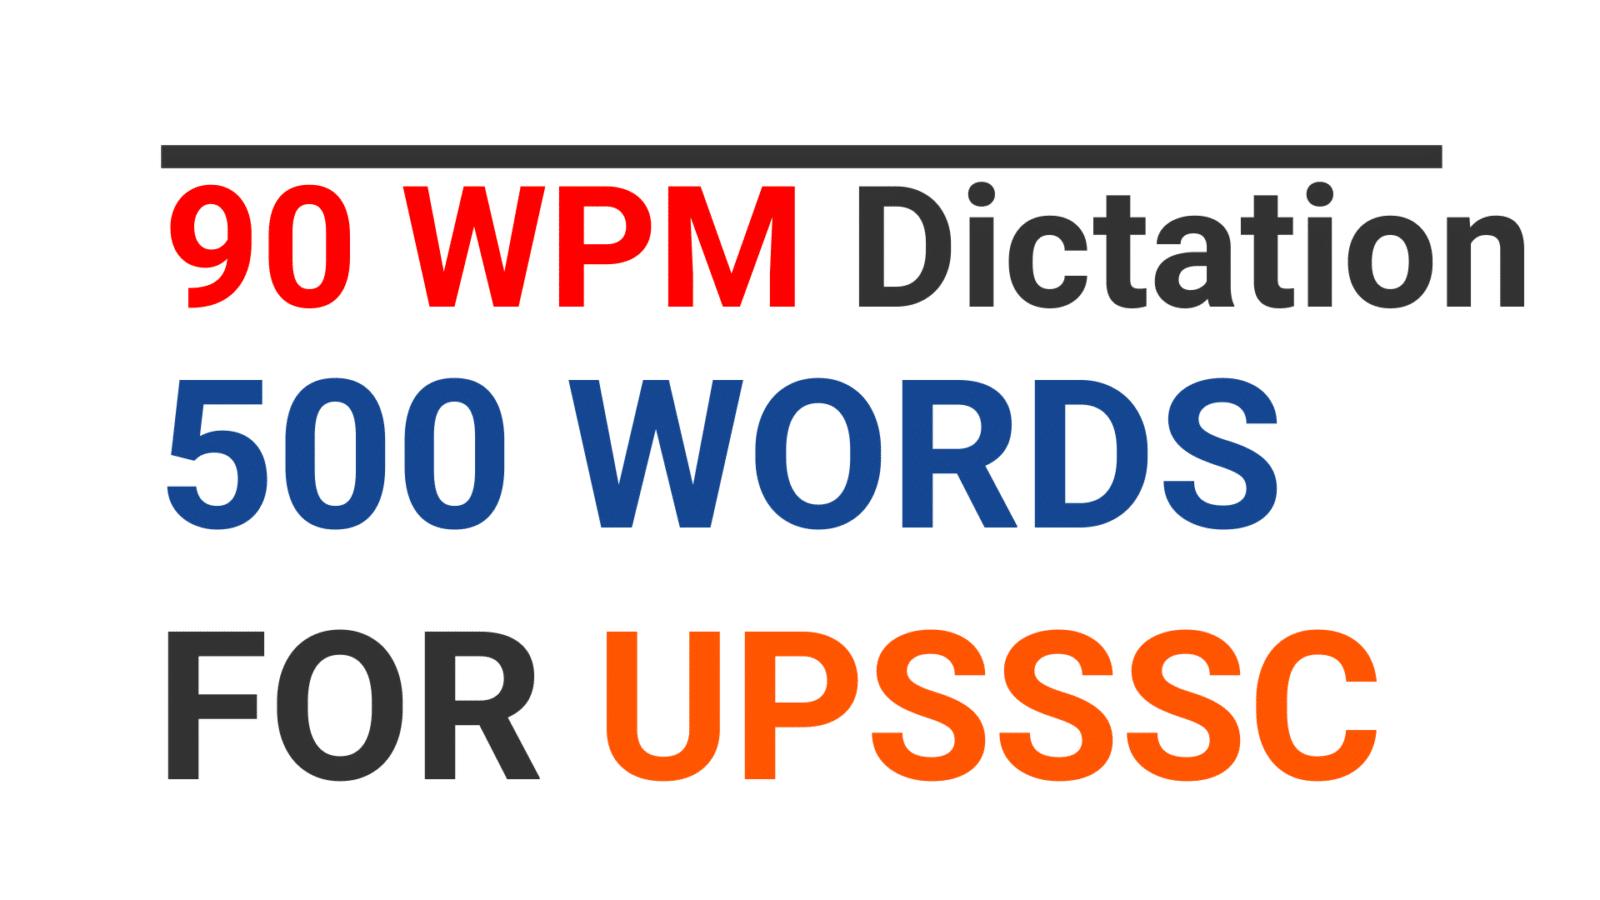 90 WPM Hindi shorthand dictation for UPSSSC